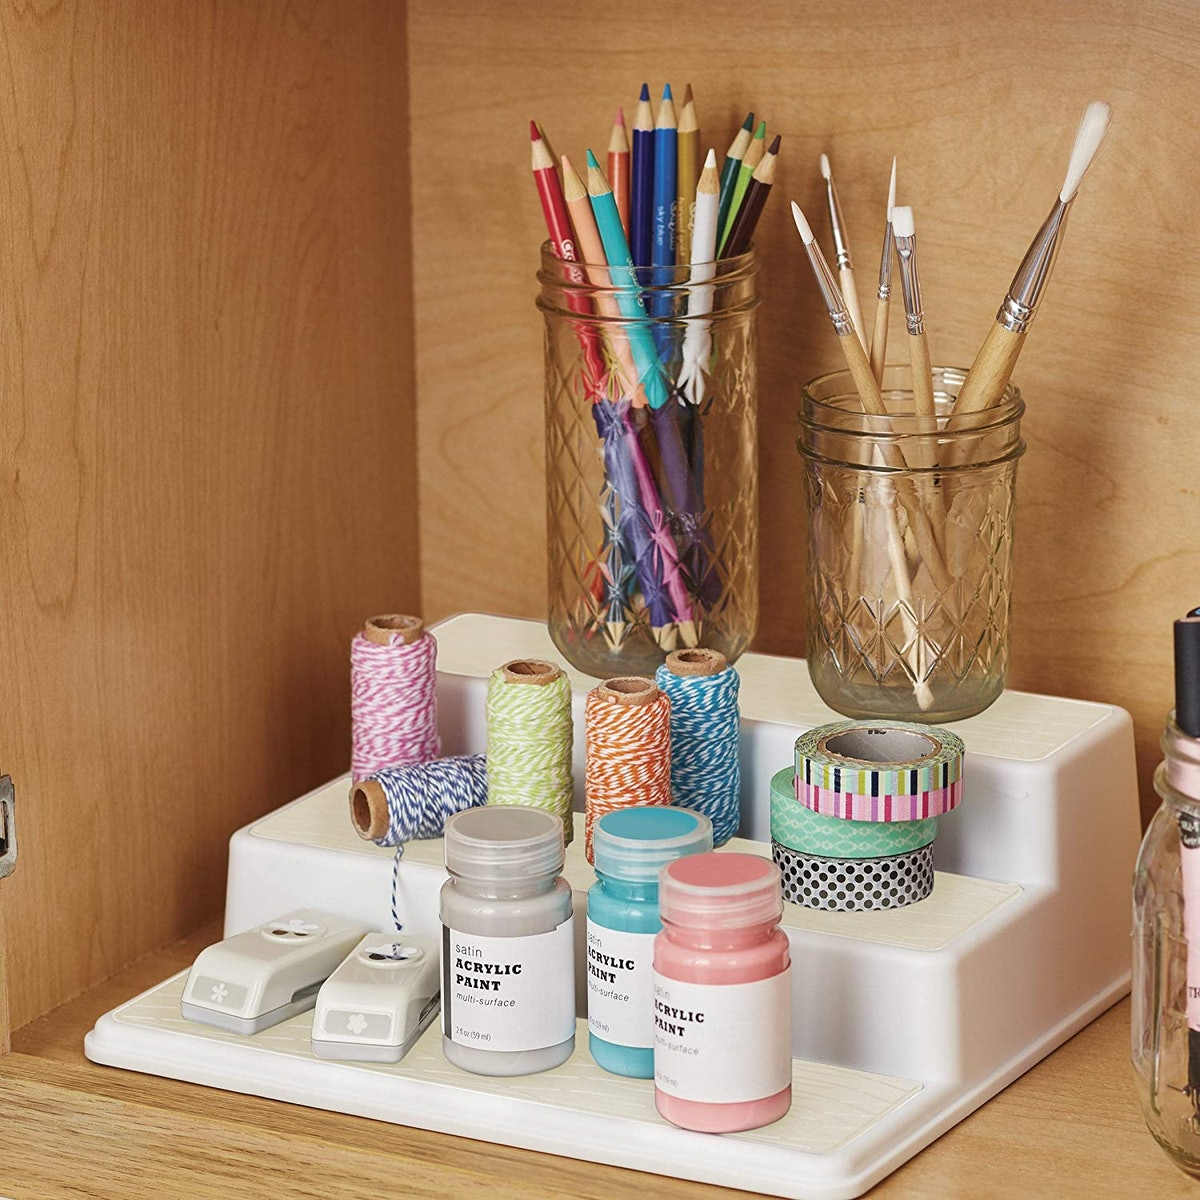 Copco Basics 3-Tier Cabinet Organizer